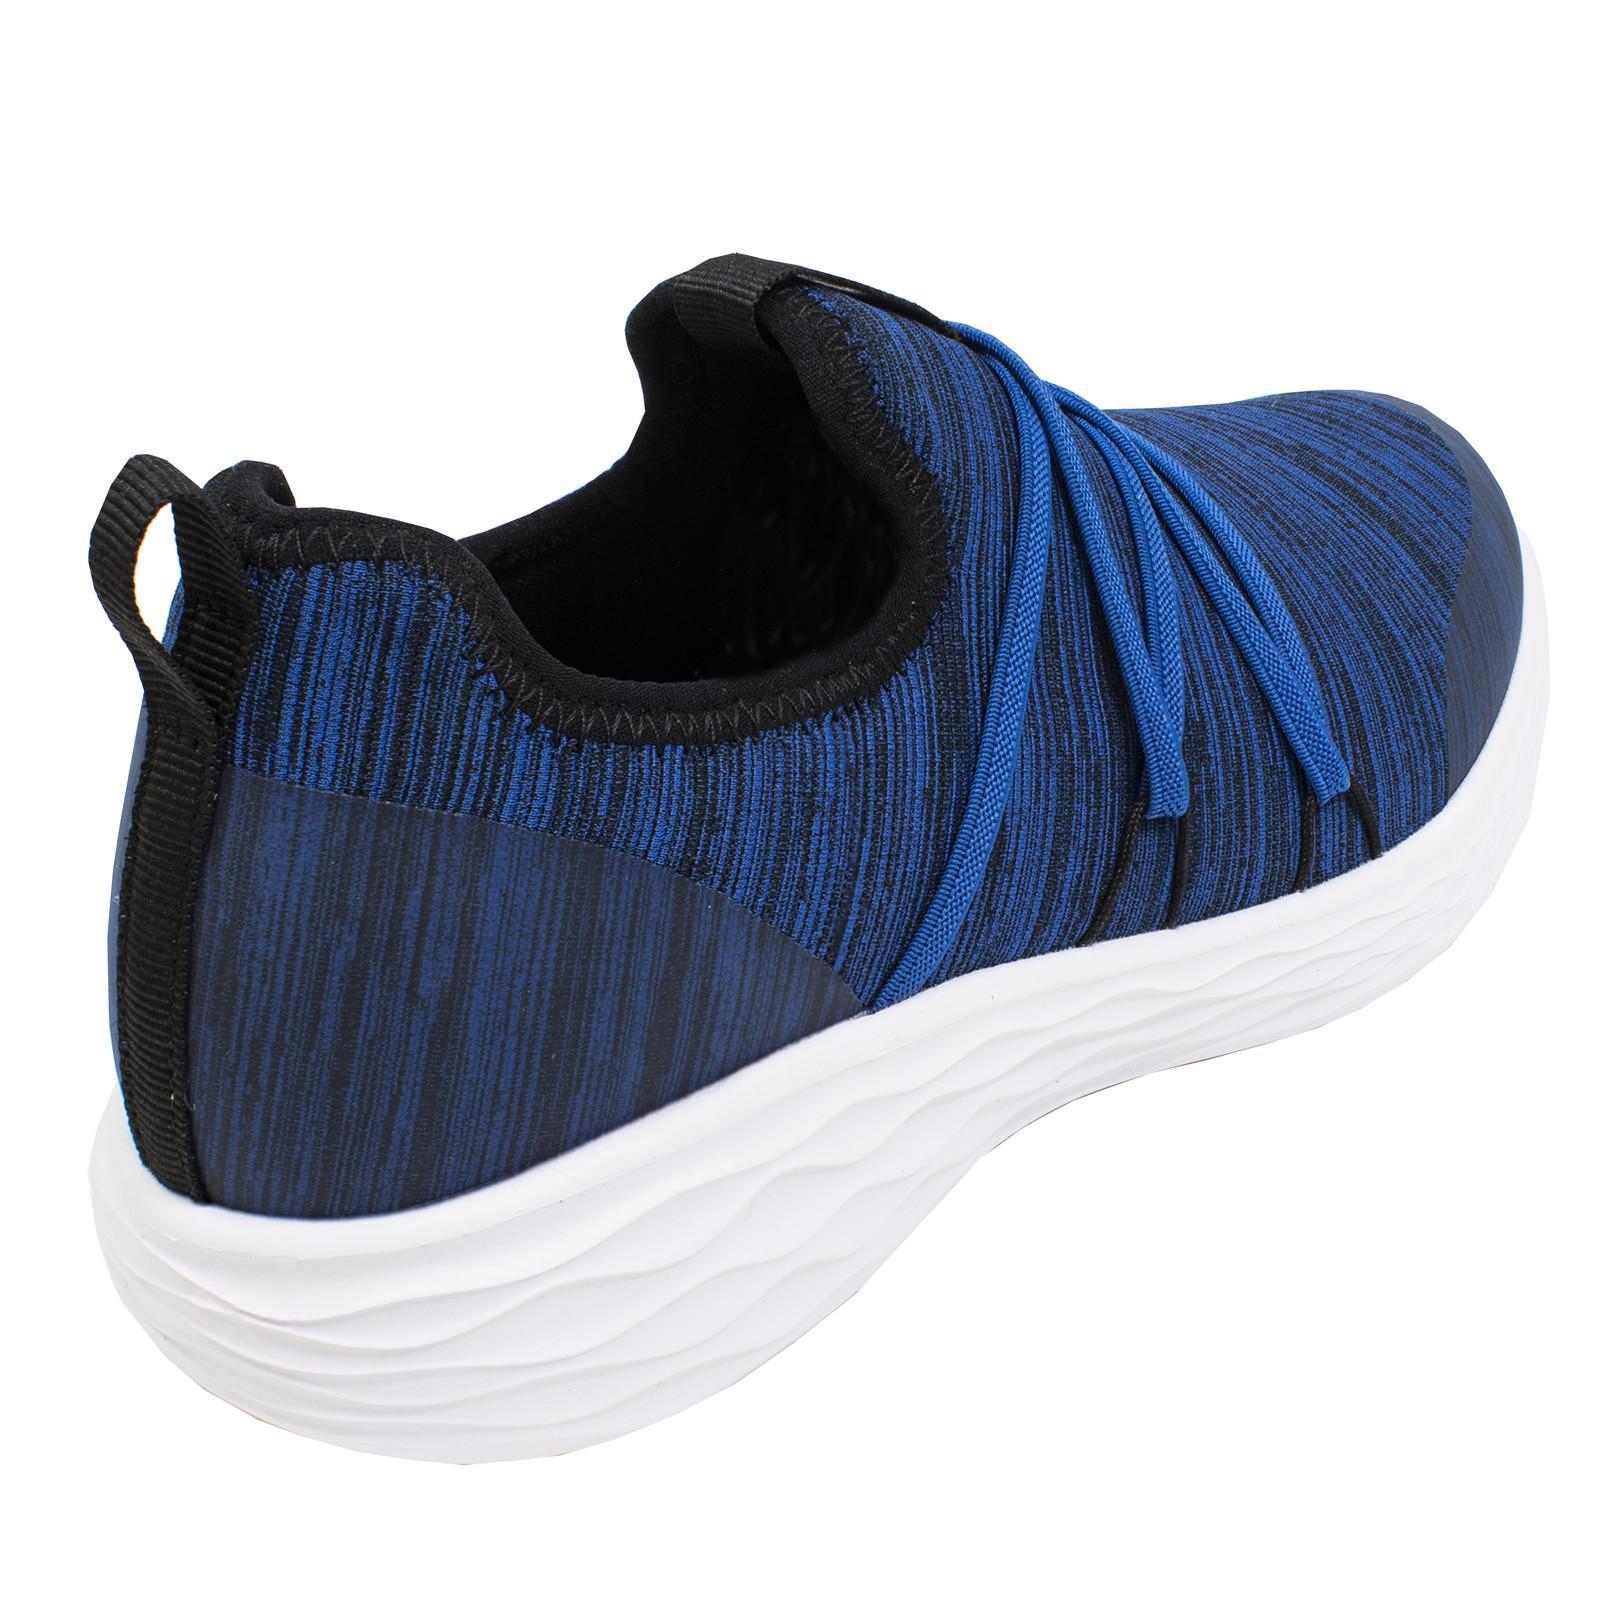 Women's High and Dry Elite Shoe Indigo-large